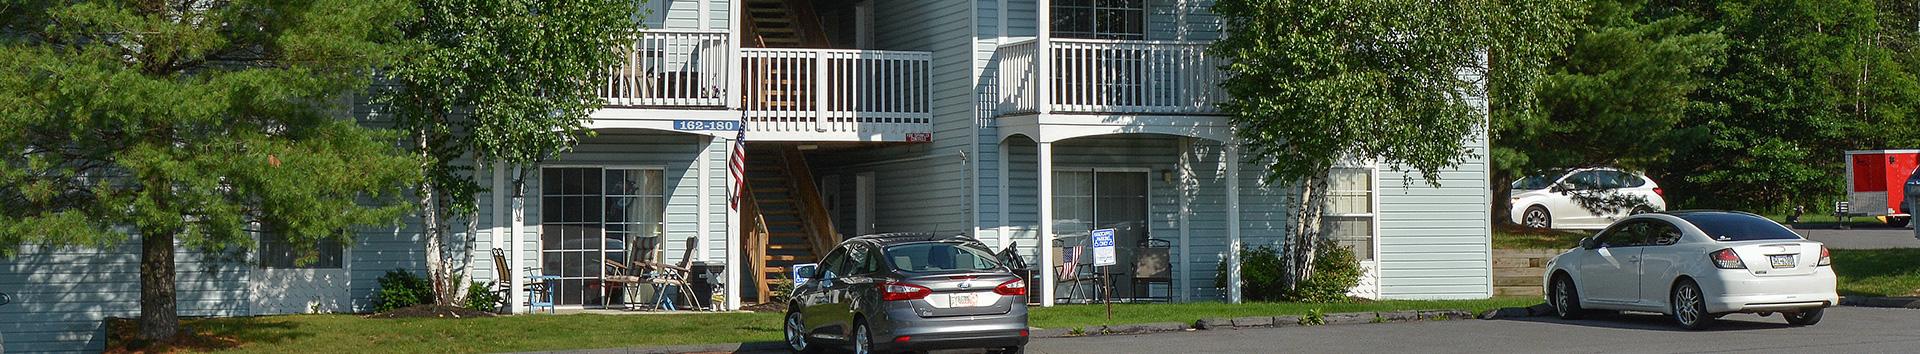 Proeprty Parking View of Manor Communities, Lancaster/Pennsylvania